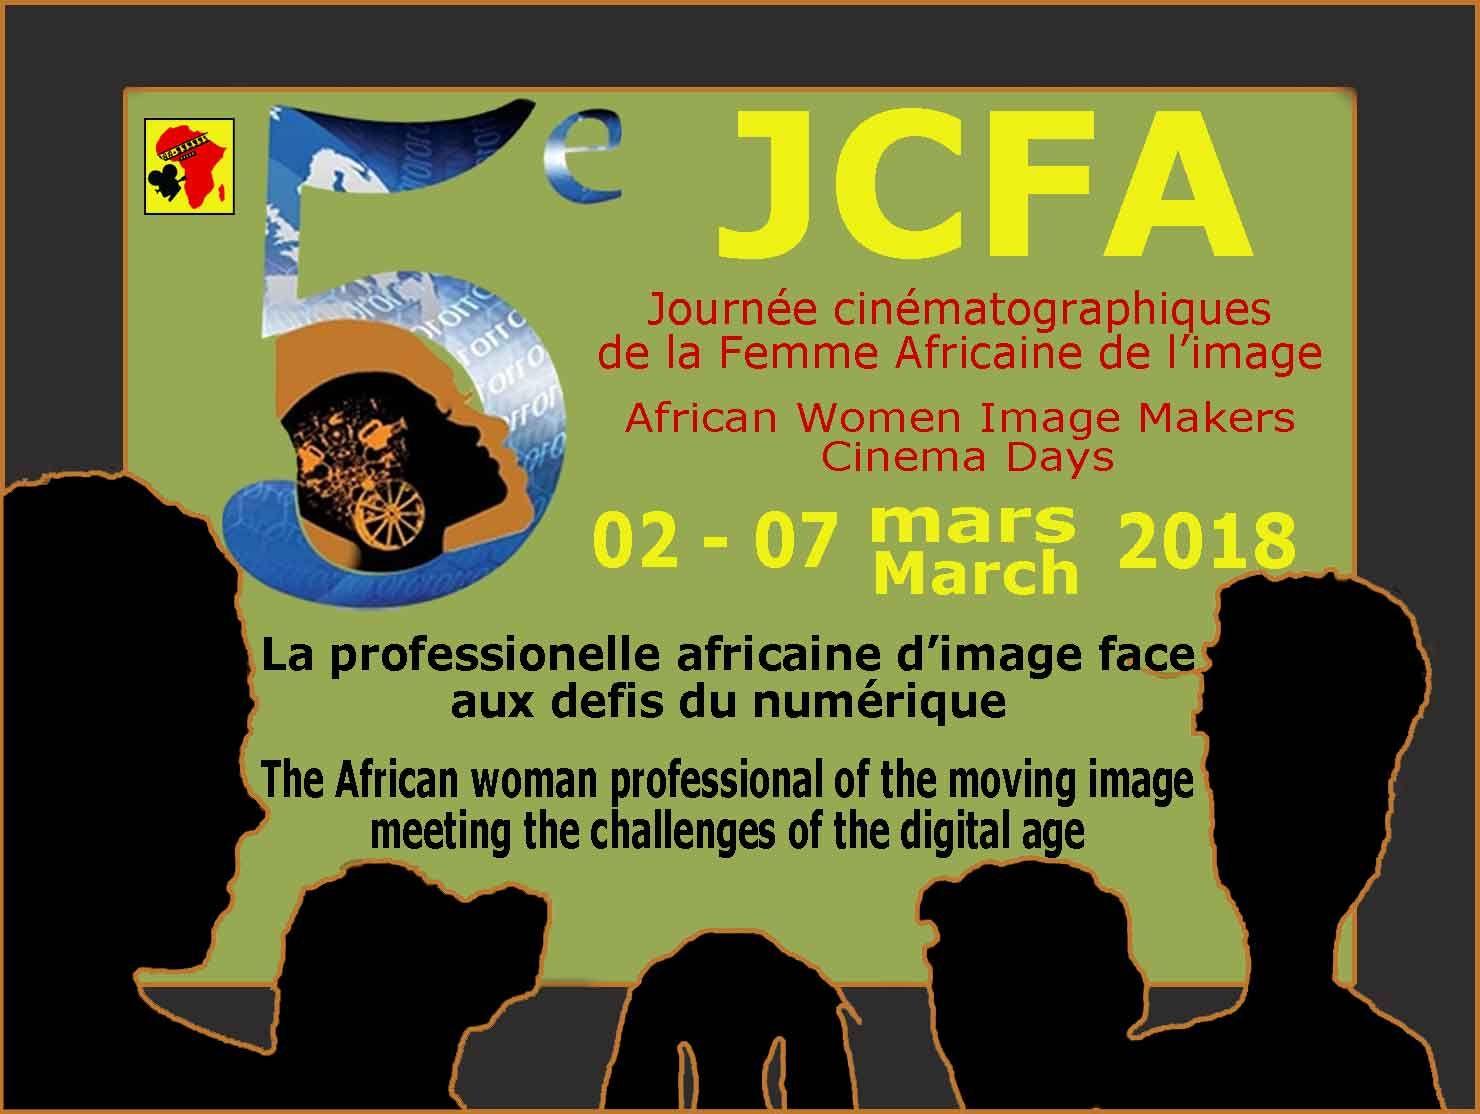 A Blog About African Women In Cinema Filmmakers Film Criticism Feminist Filmmaking Producers Actresses Film Festivals African Women Professional Women Cinema